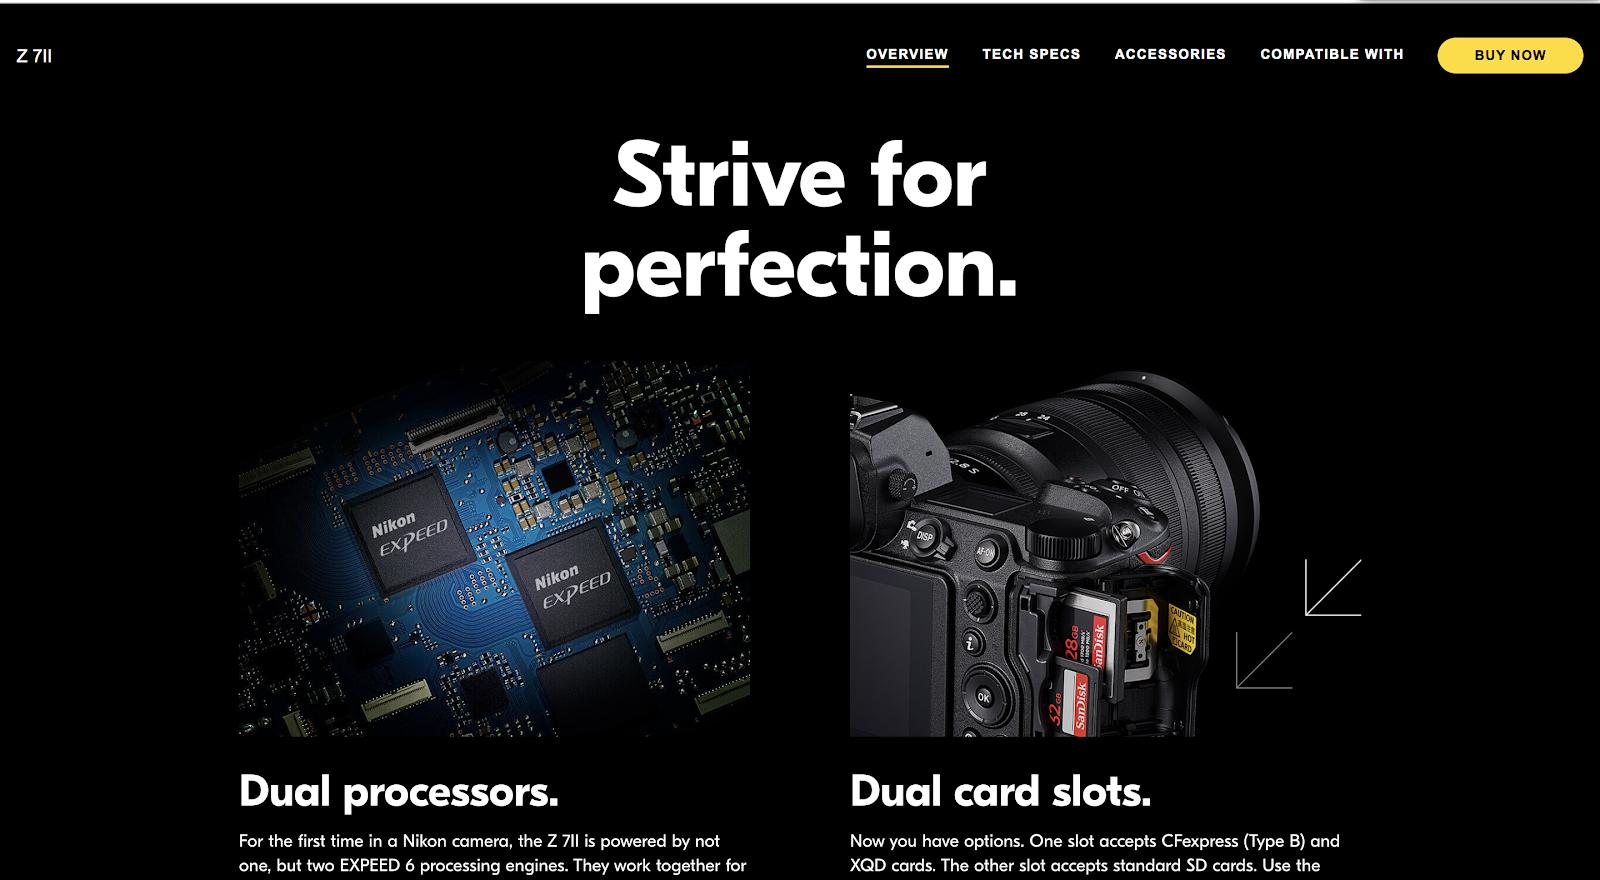 Multilingual Website Example: Nikon Canada product page